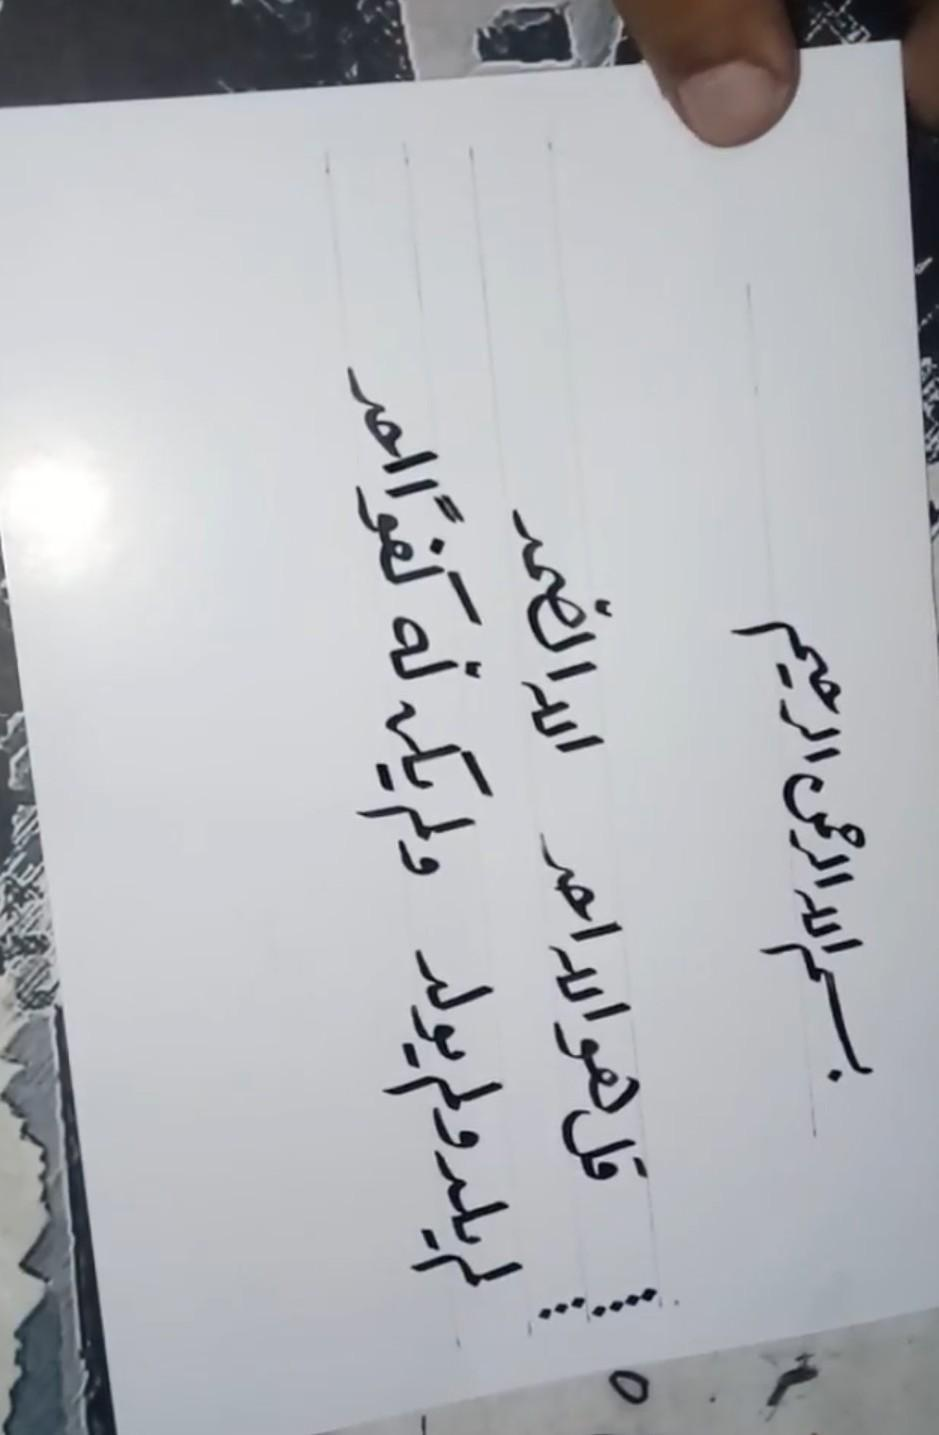 Tolong Bantuu Buatkan Kaligrafi Kaka Menulis Surat Al Ikhlas Dengan Khat Riq Ah Contoh Brainly Co Id